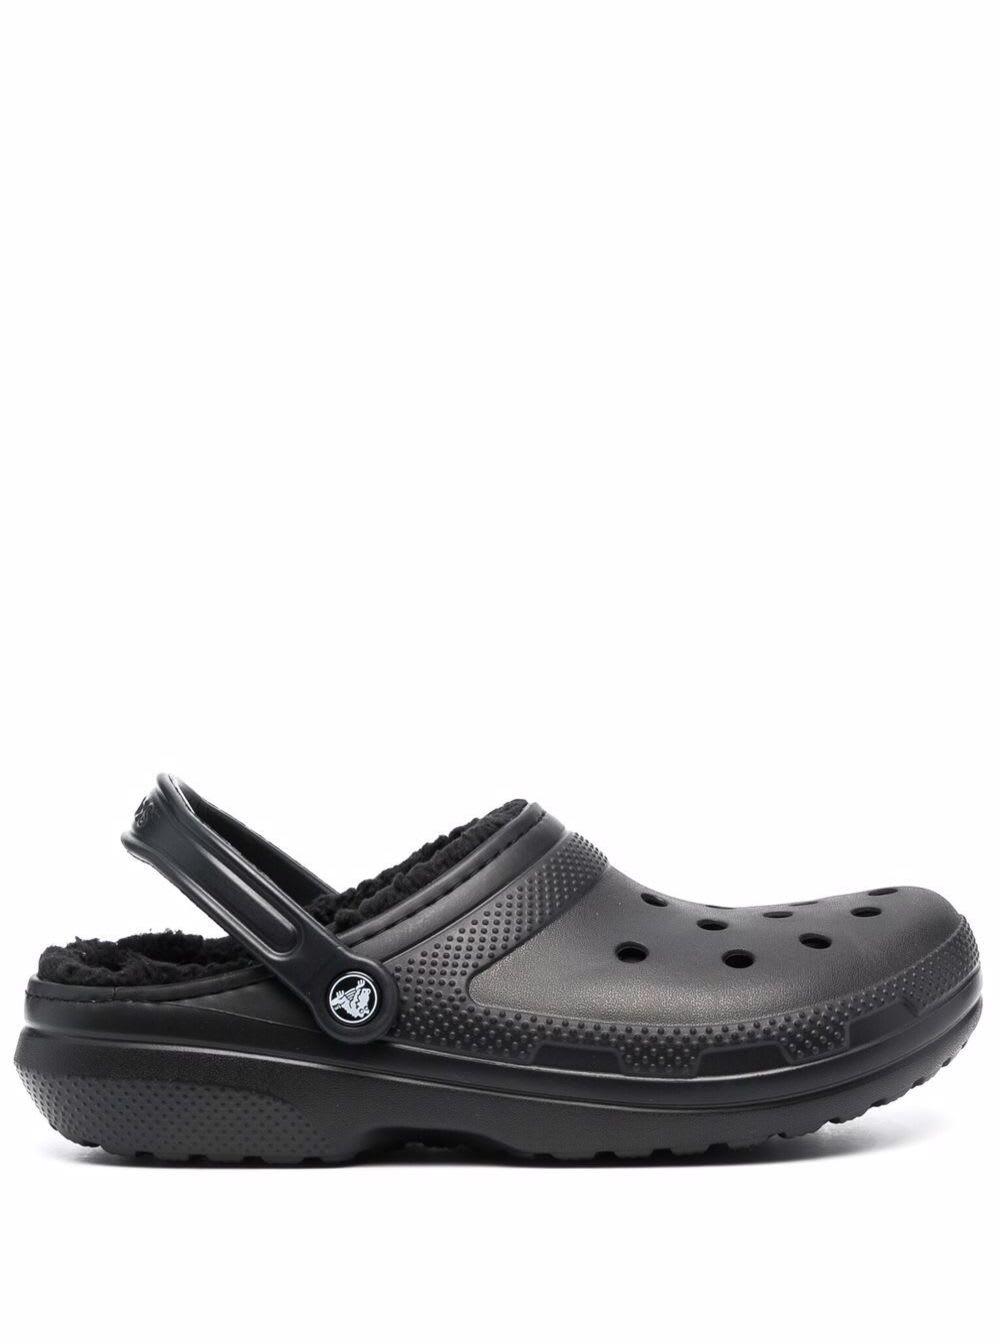 Classic Lined Clog Sandals